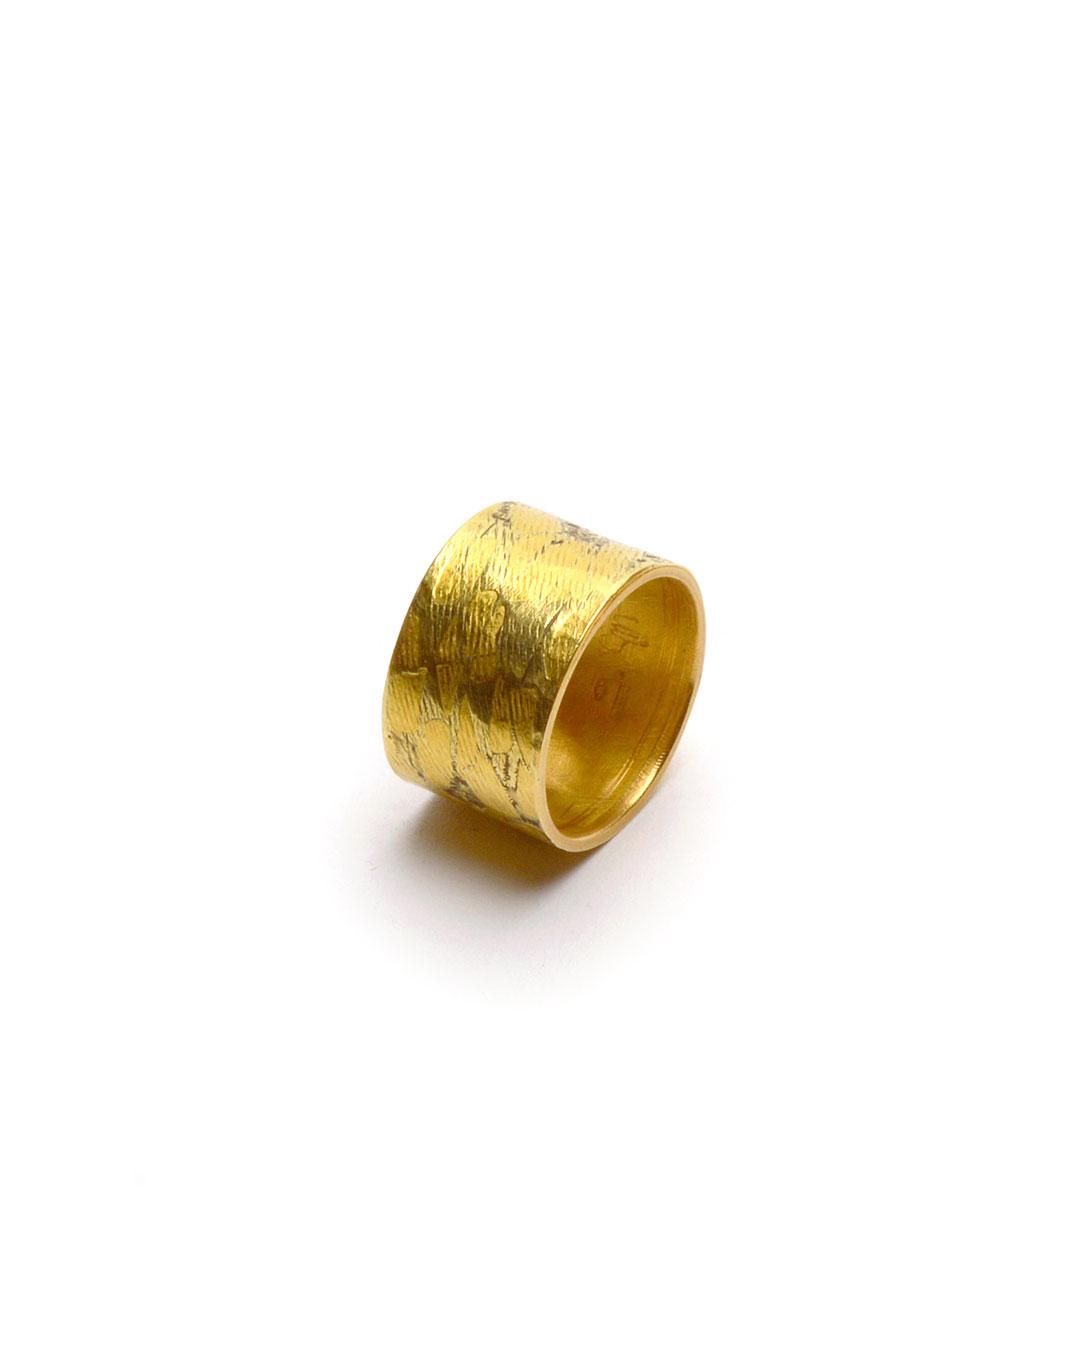 Stefano Marchetti, untitled, 2000, ring, gold, 20 x 20 x 12 mm, €5000